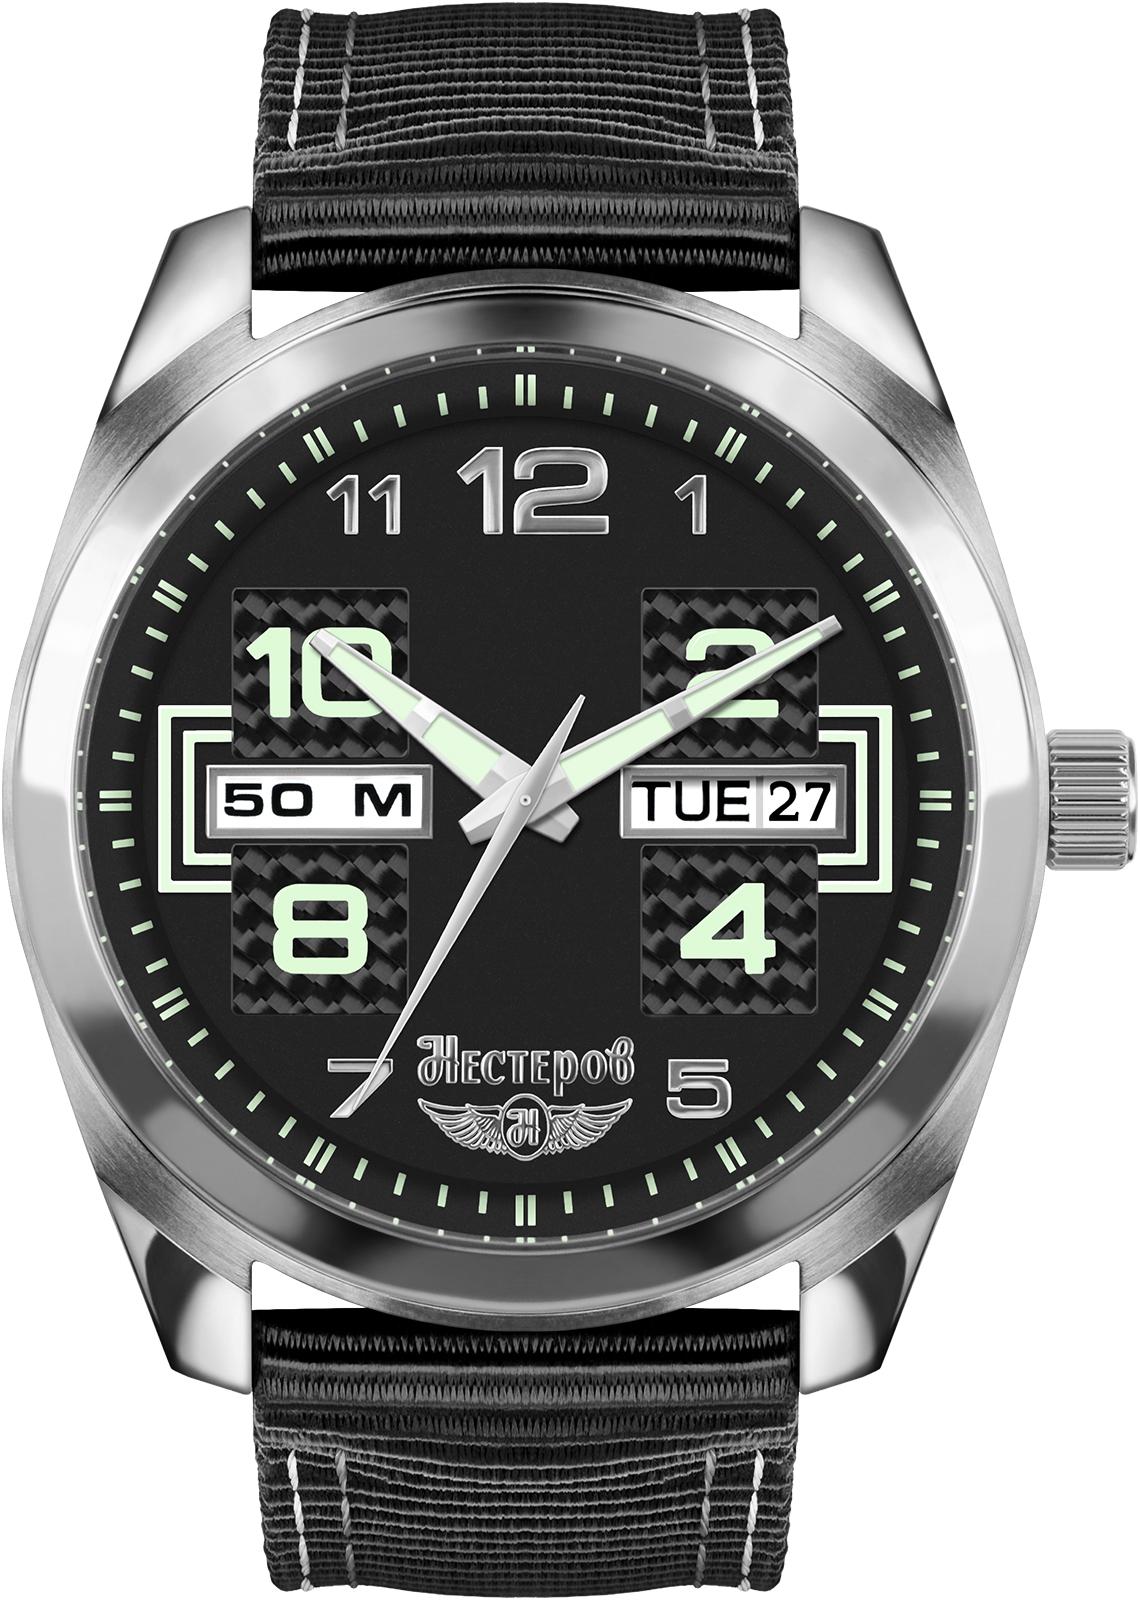 Часы Нестеров H1185A02-175E, черныйH1185A02-175EЧасы мужские наручные